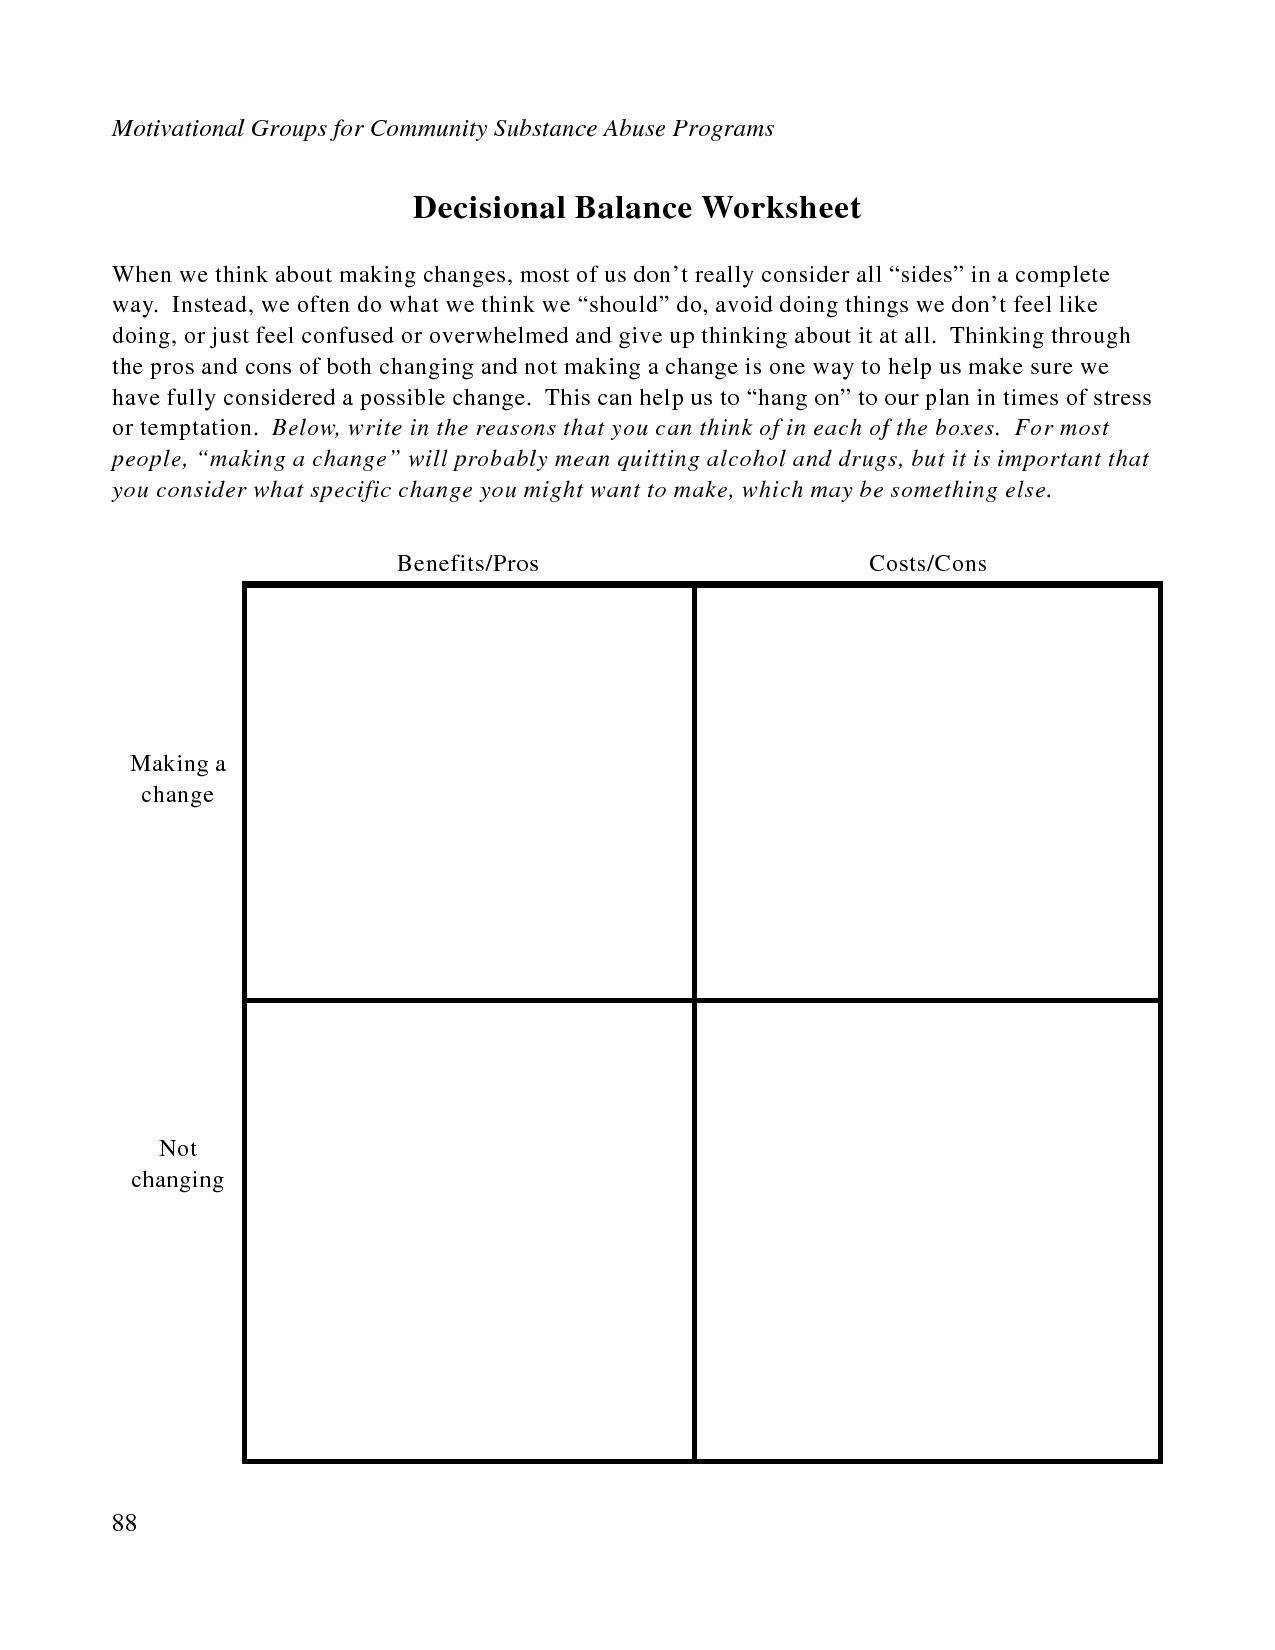 Free Printable Dbt Worksheets | Decisional Balance Worksheet - Pdf | Free Printable Counseling Worksheets